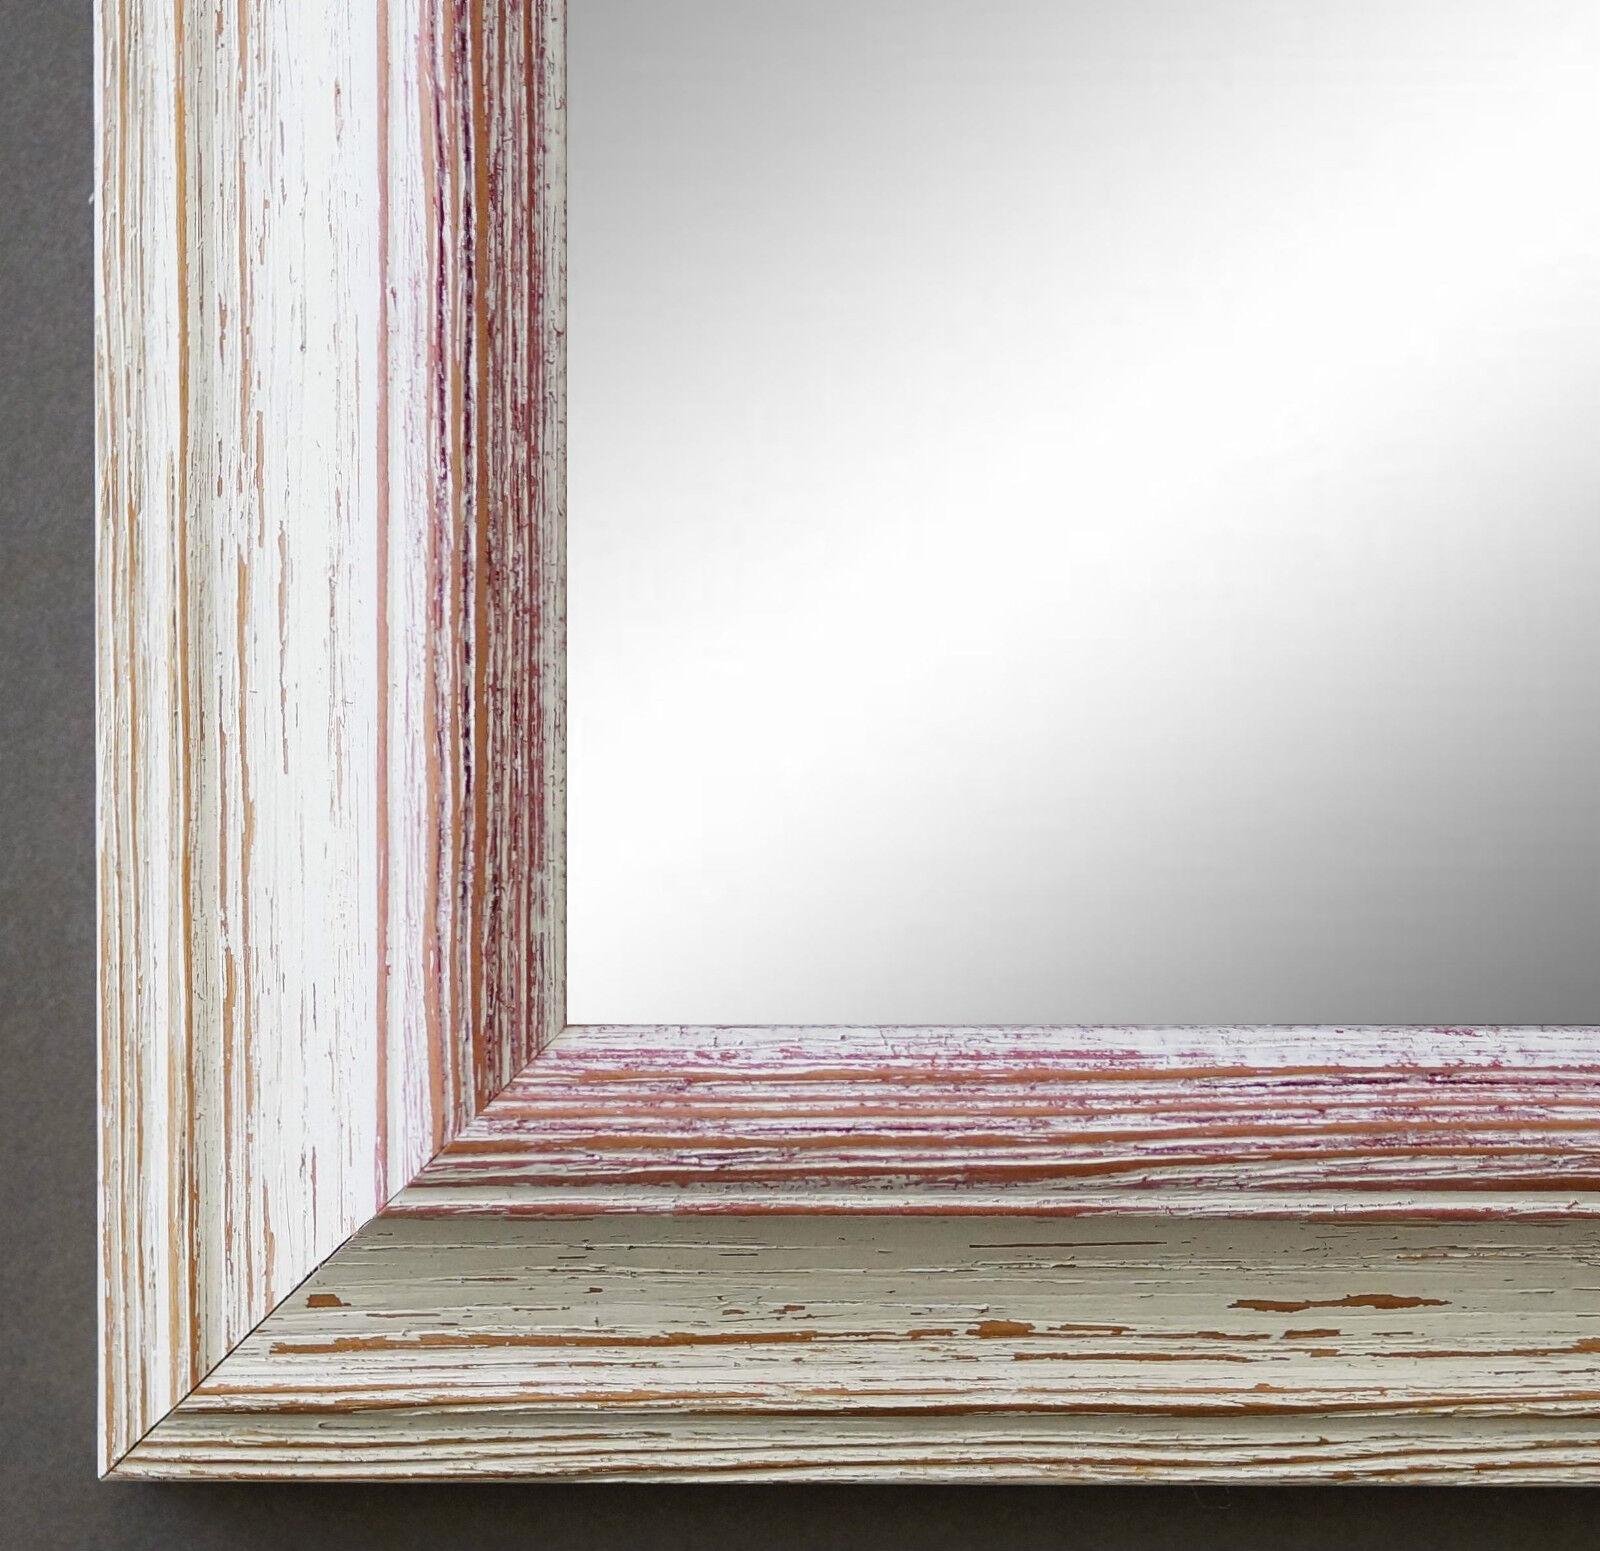 Wandspiegel Hochformat Querformat Bari Antik Beige Rot 4,2 - NEU alle Größen